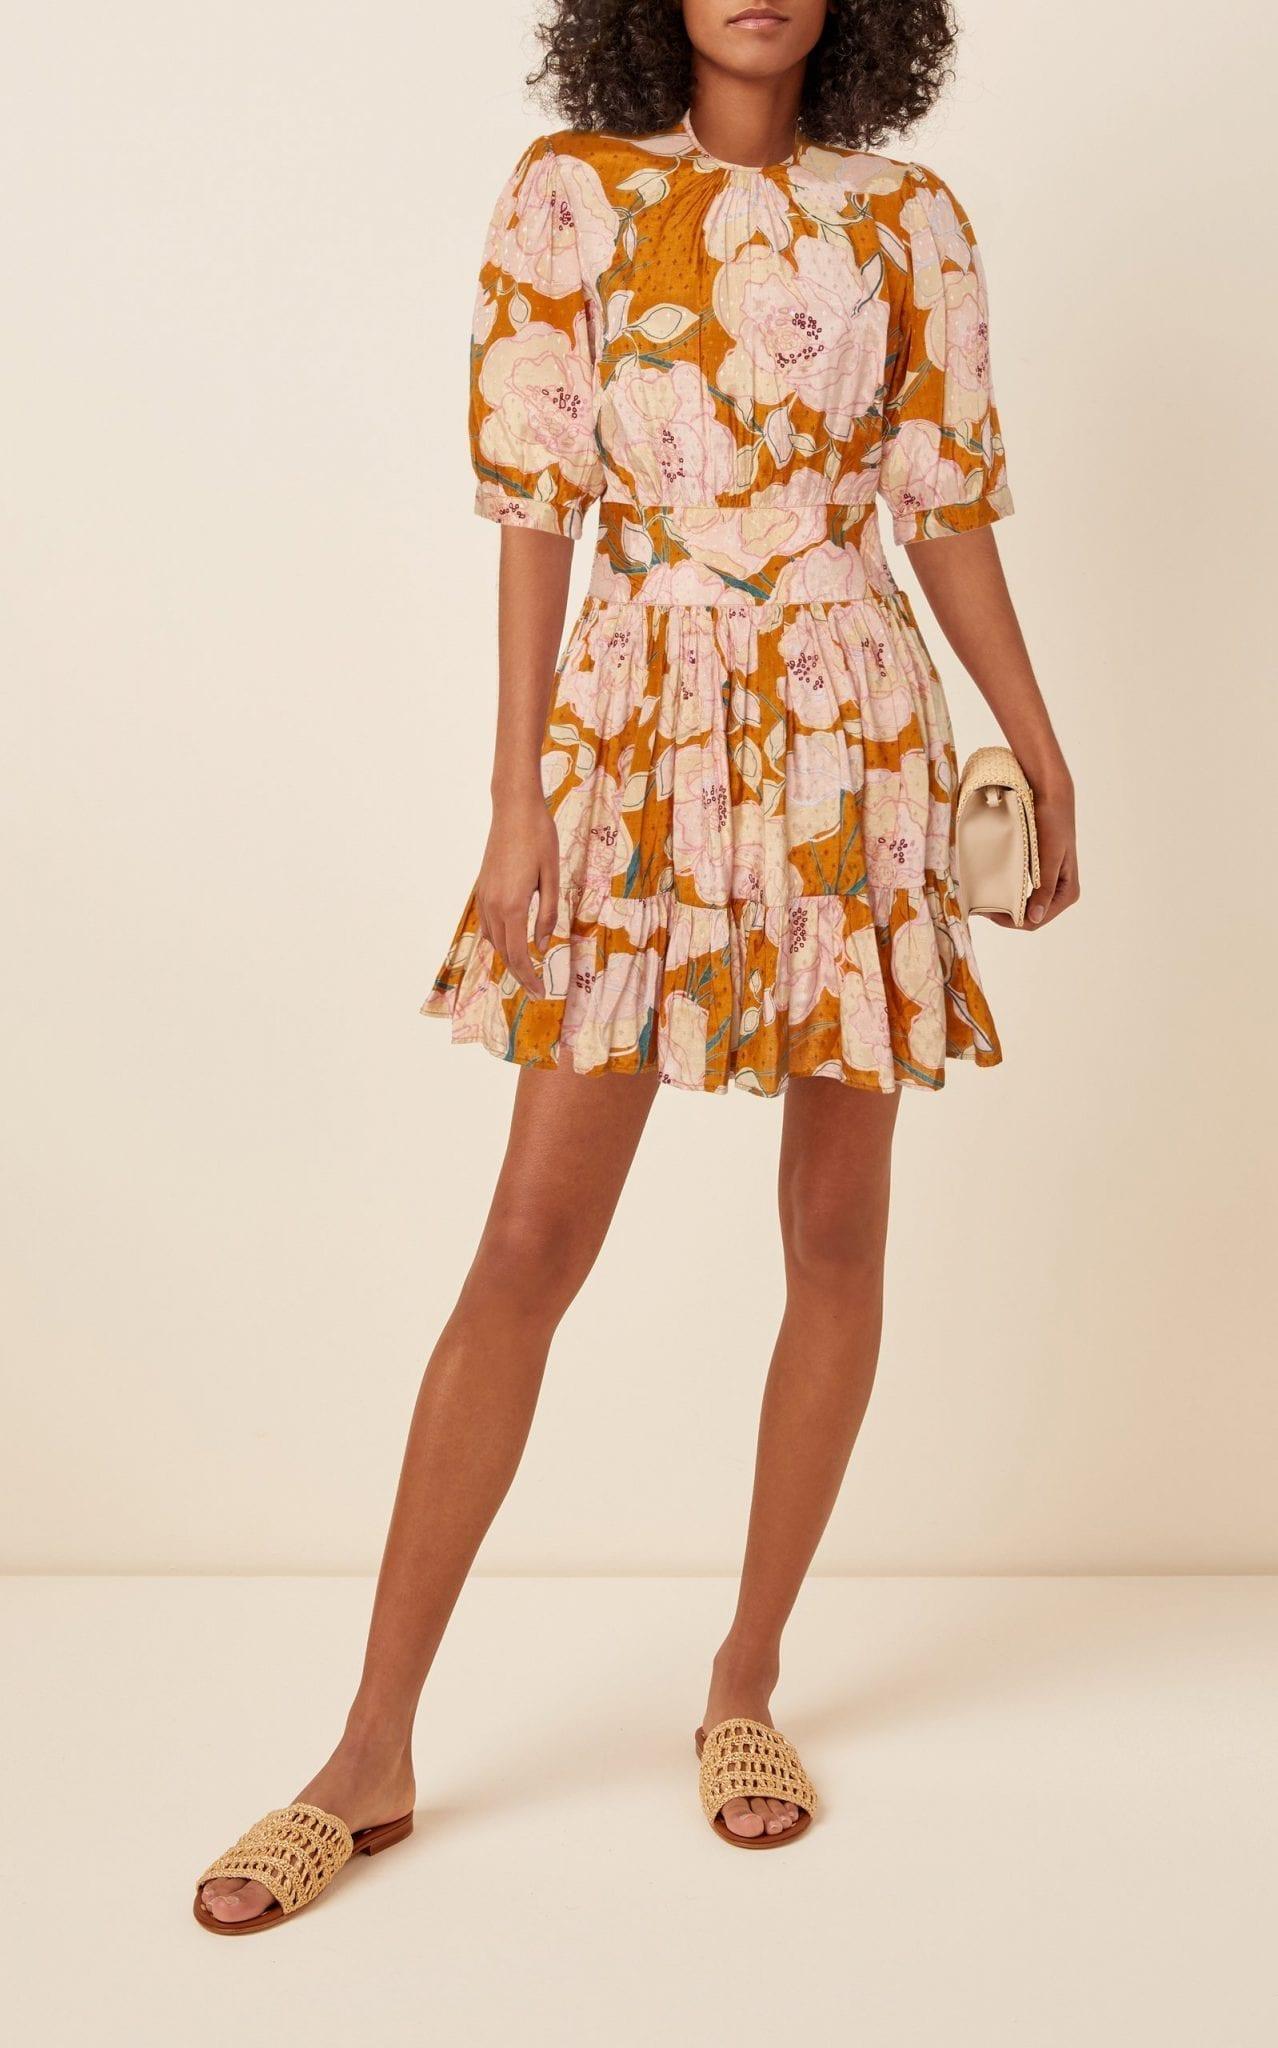 BYTIMO Delicate Floral-Print Crepe Mini Dress